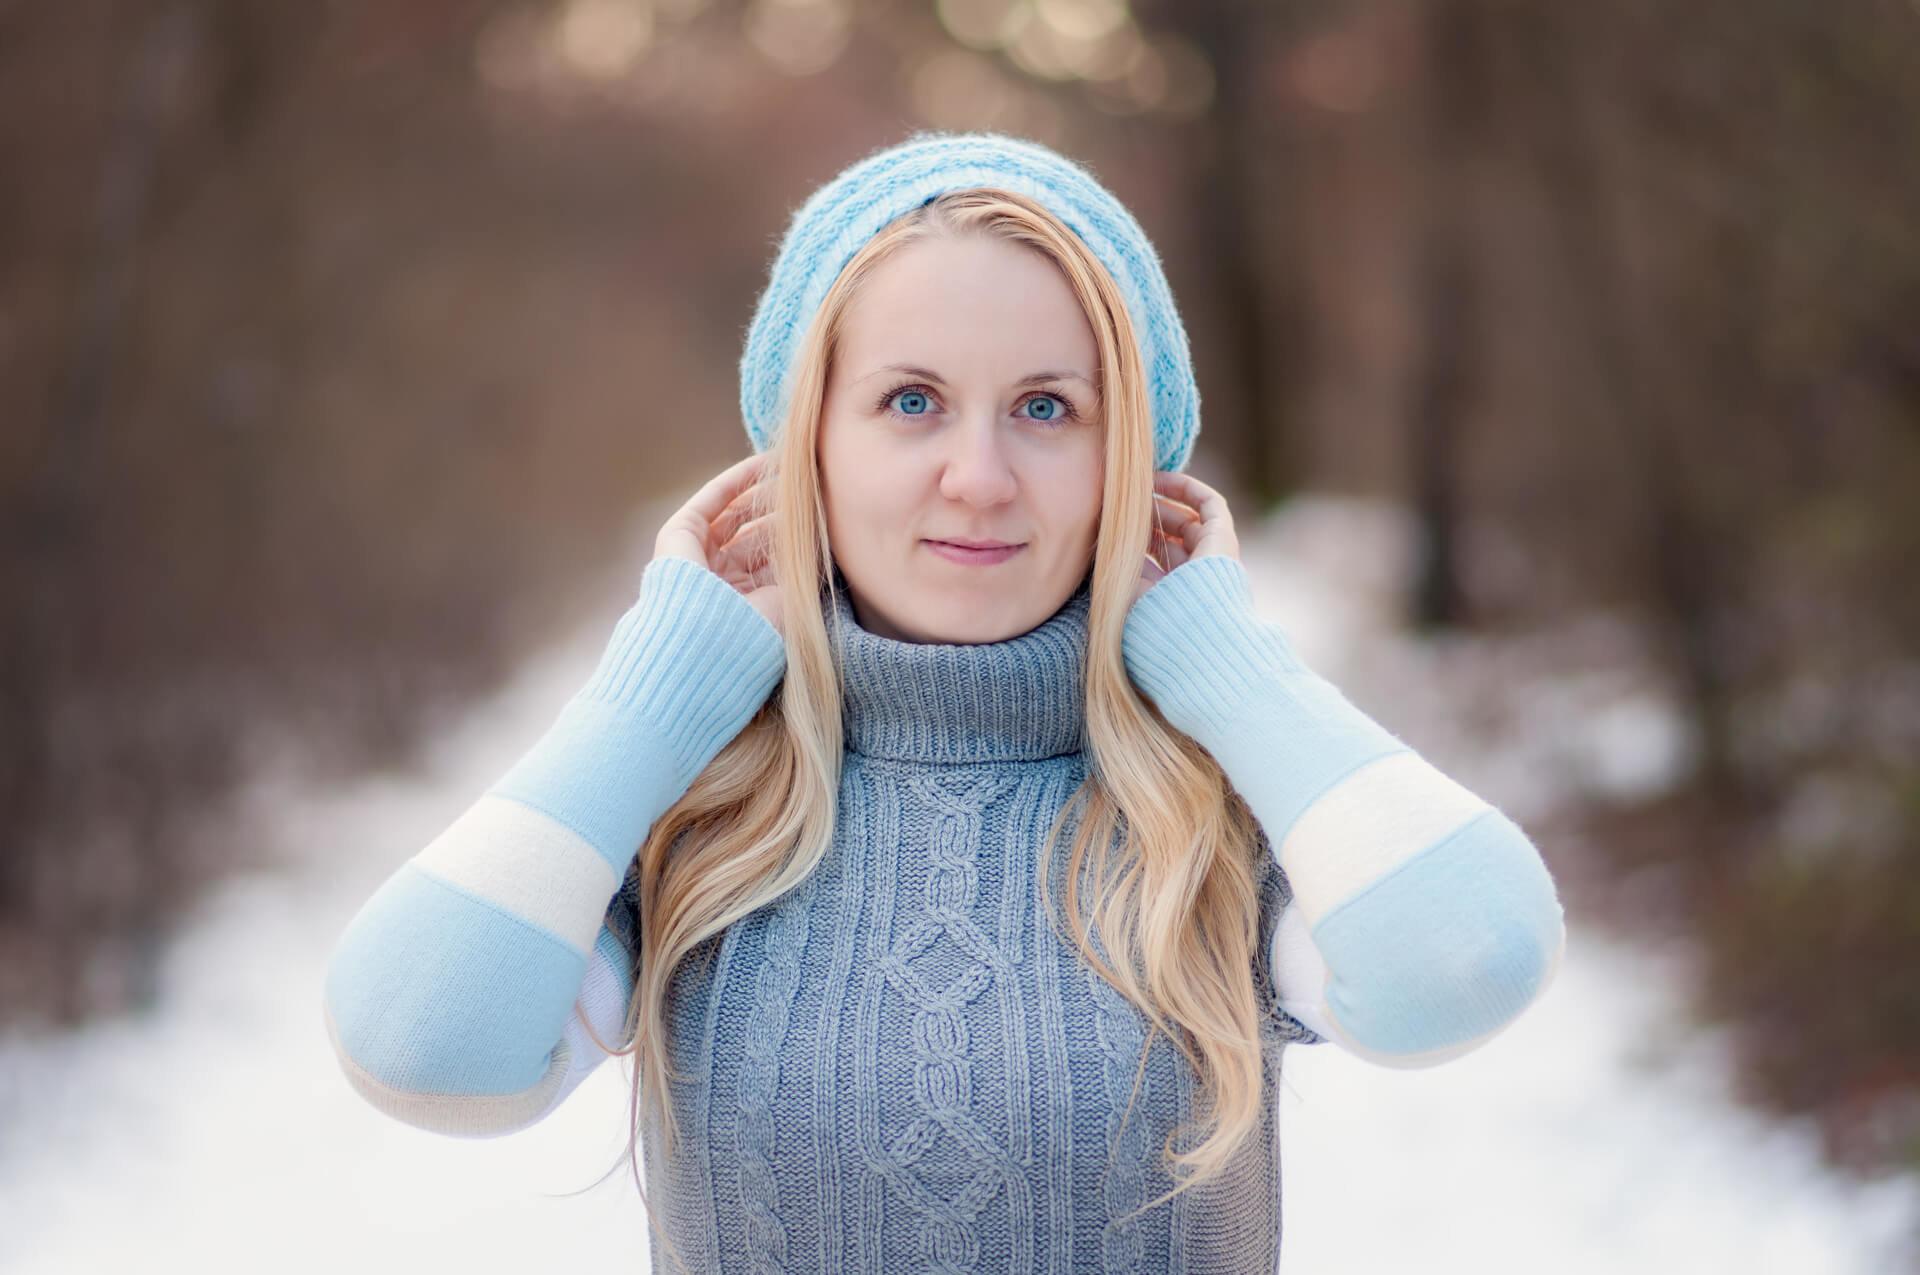 profesionalne-fotenie-exterier-zima-portret-park-kosice-peter-norulak_01